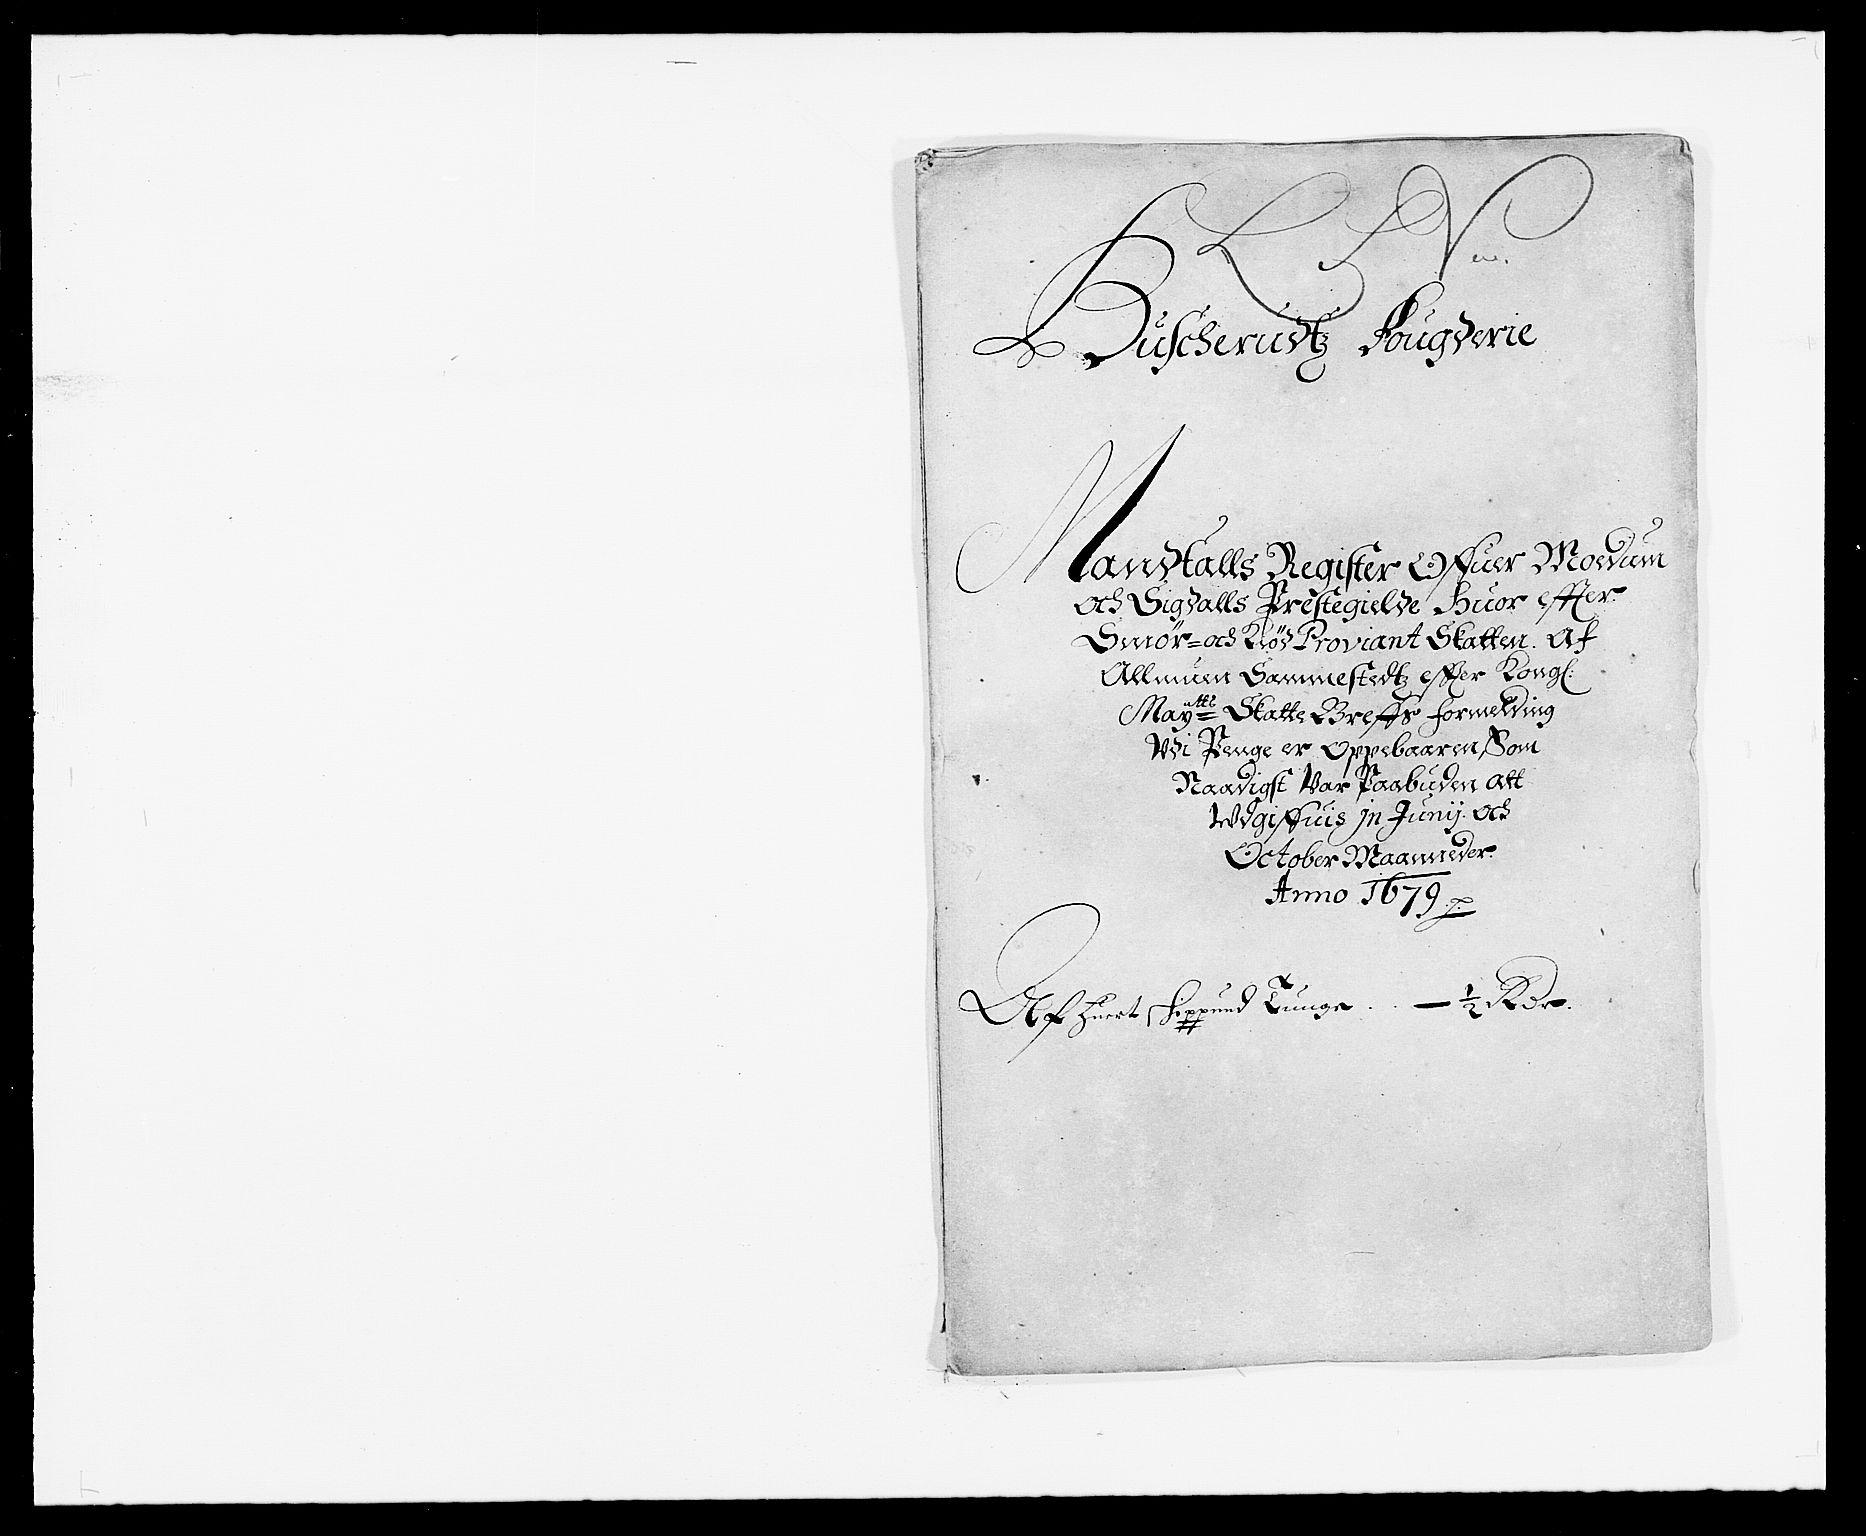 RA, Rentekammeret inntil 1814, Reviderte regnskaper, Fogderegnskap, R25/L1674: Fogderegnskap Buskerud, 1678-1681, s. 293